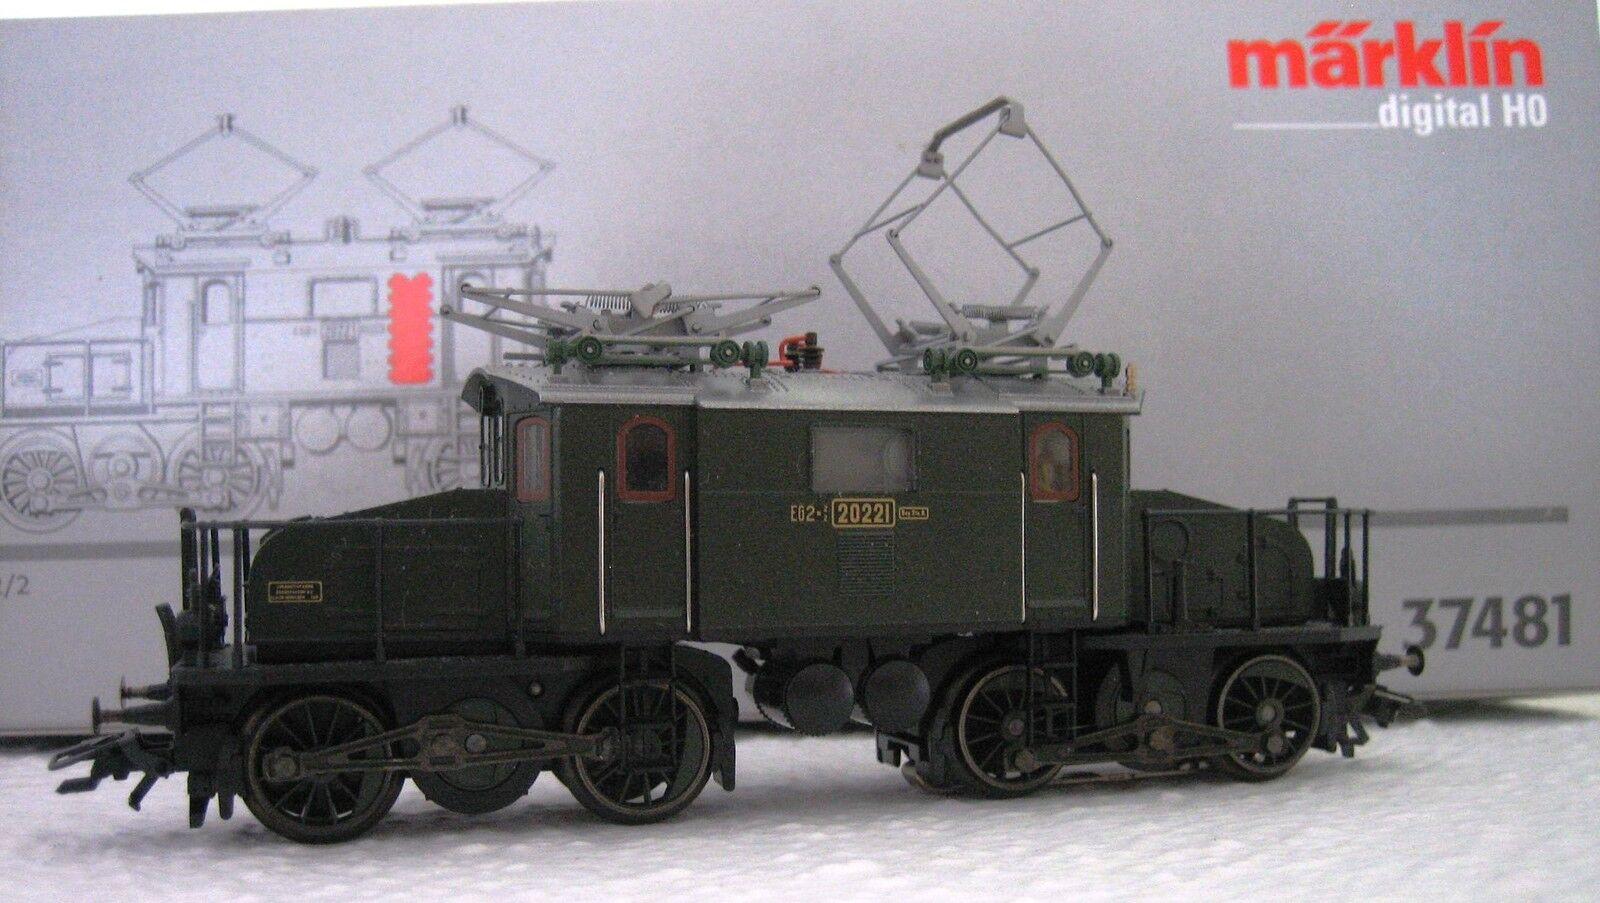 Märklin H0 37481 Electric Locomotive Eg 2x2 2 Digital New Condition Original Box